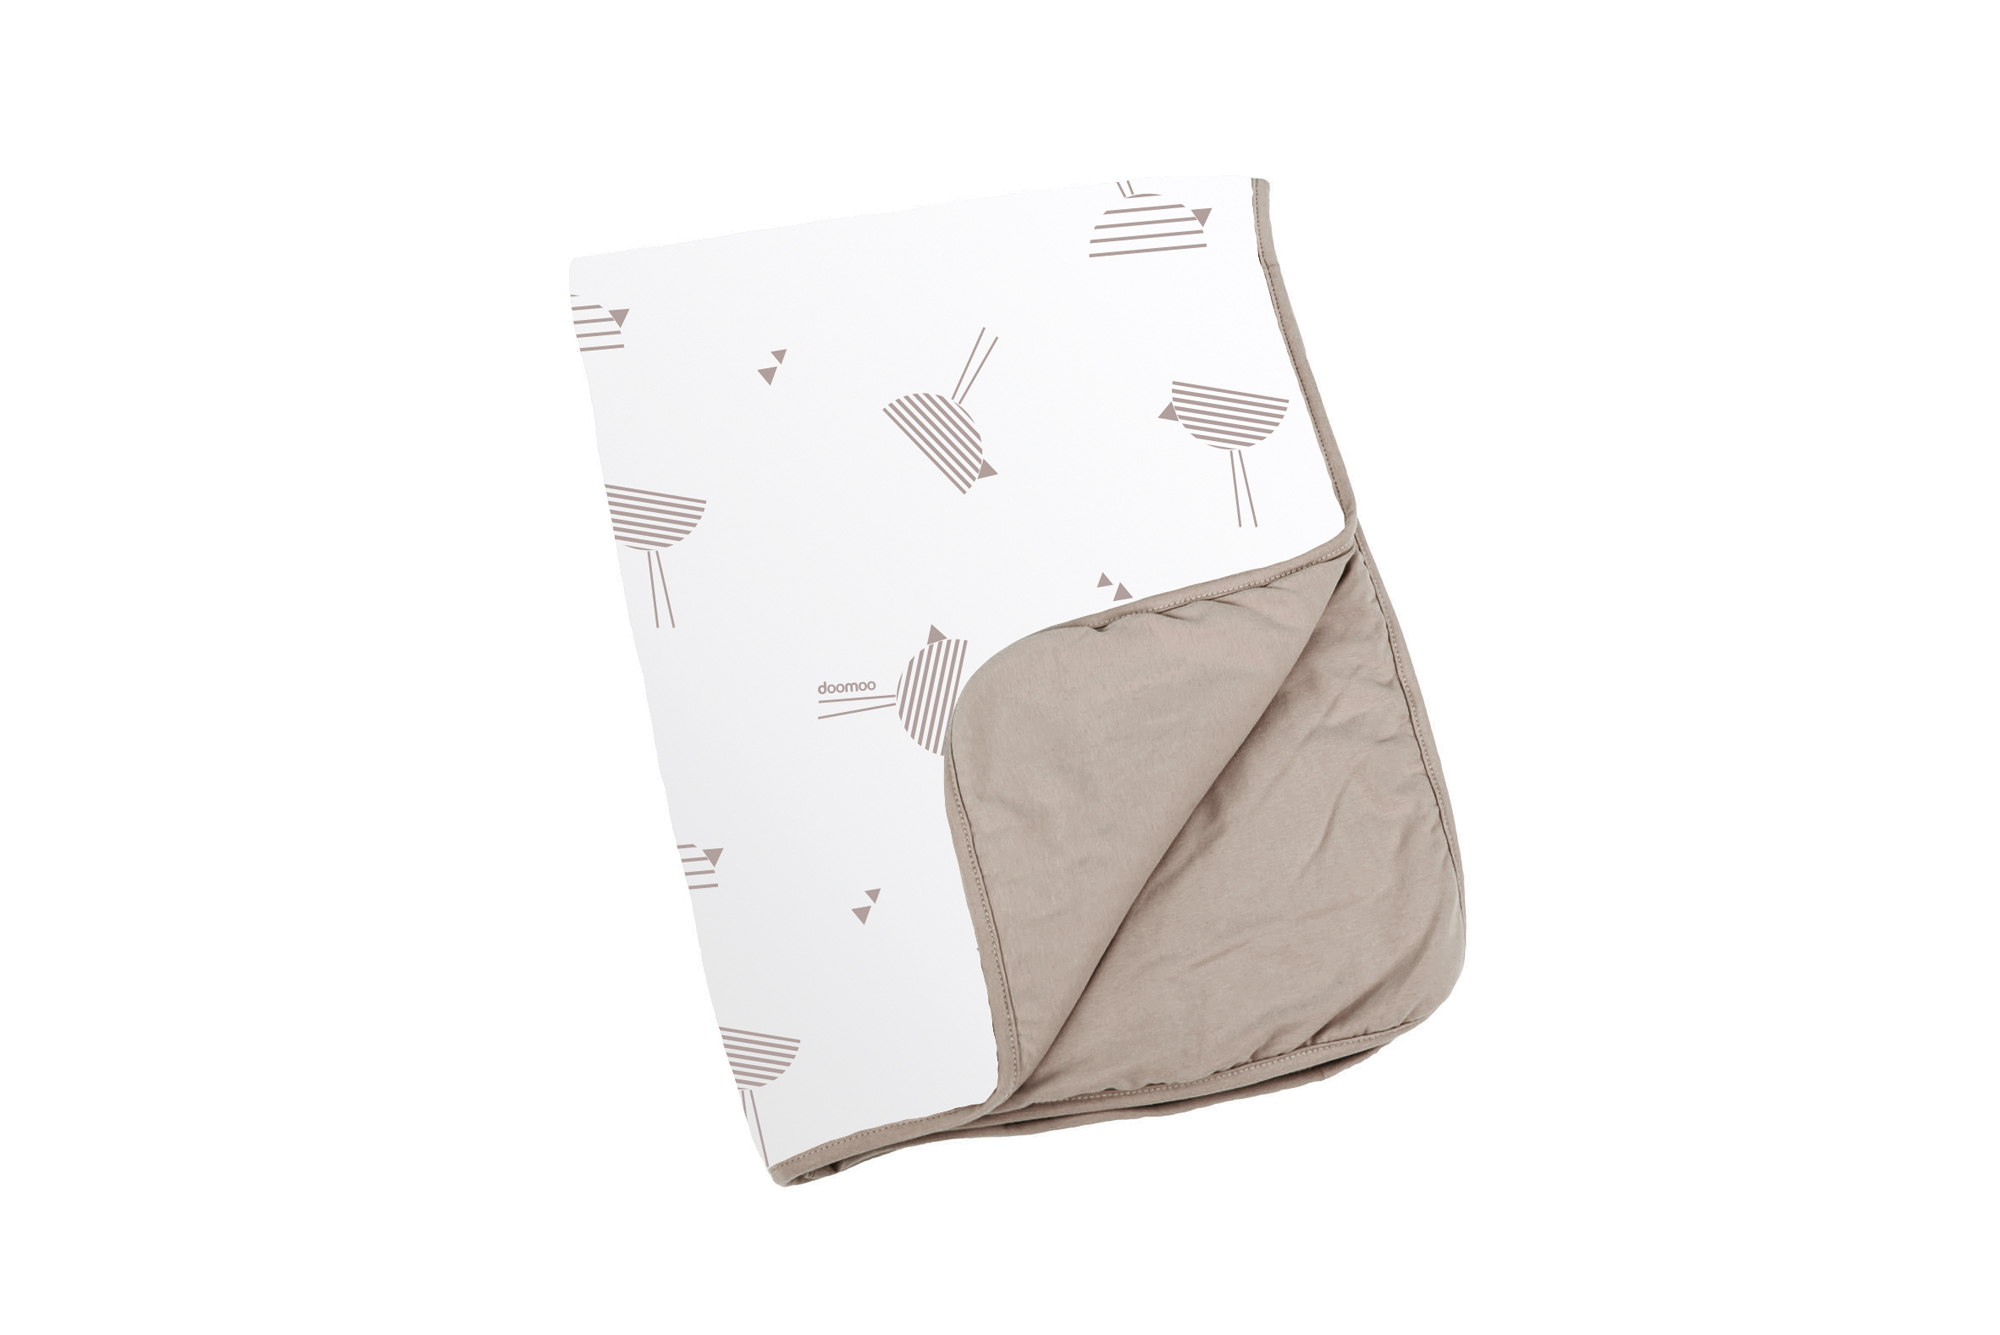 Doomoo Dream bavlněná deka, Col.DS59 75x100